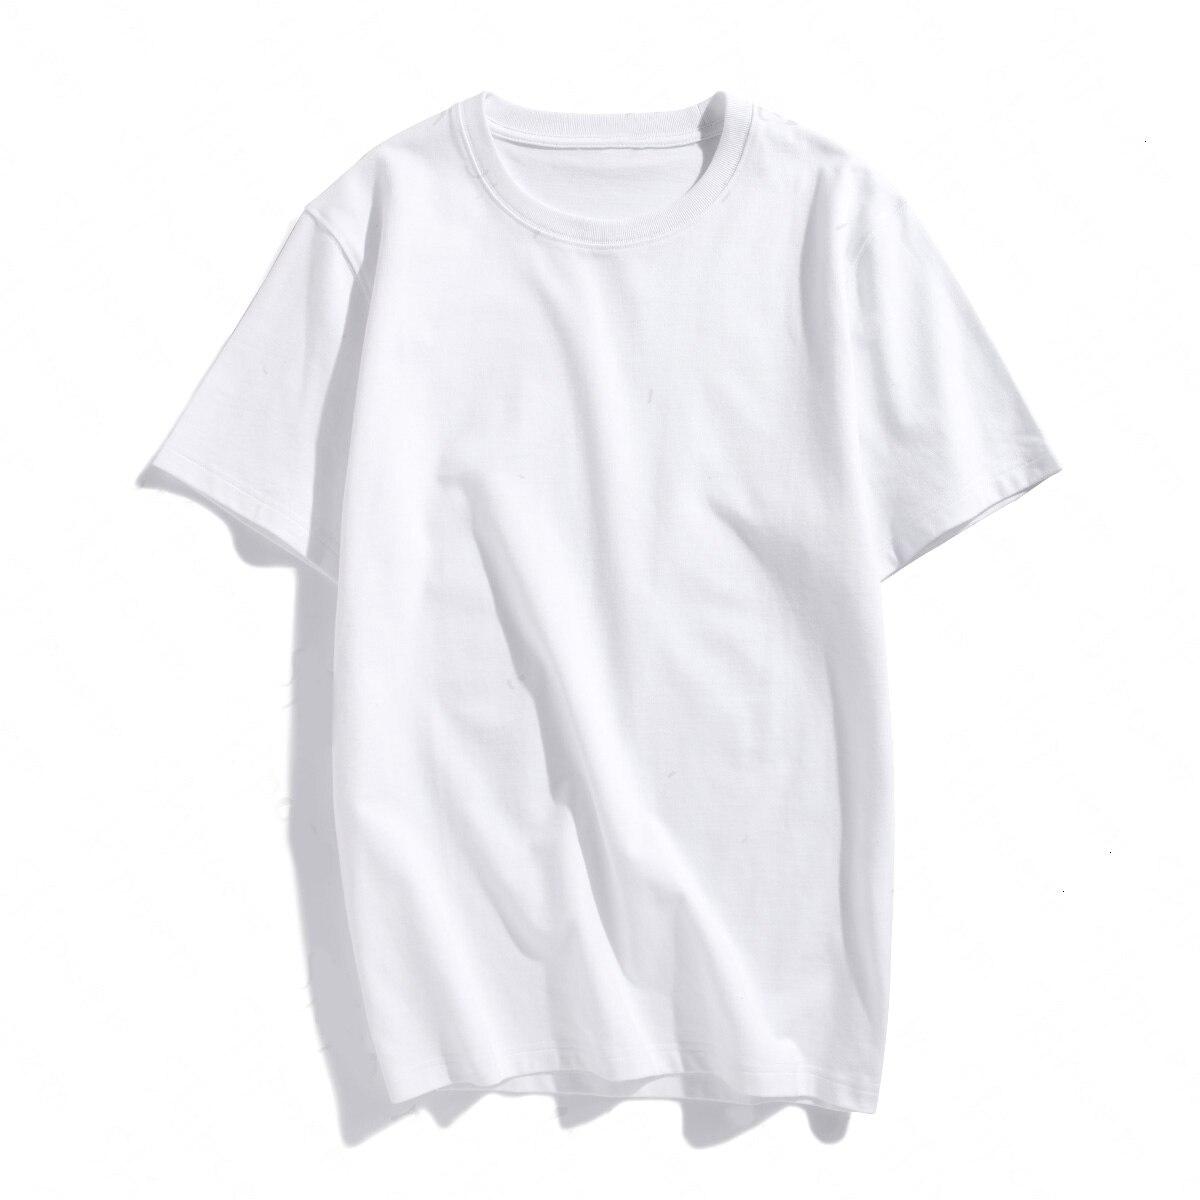 HUNTER X HUNTER HISOKA MOROW Hoodies 12 Color Hooded Tops UNISEX basic print Sweatshirt Long-sleeved  Plus Velvet  Streetwear 7